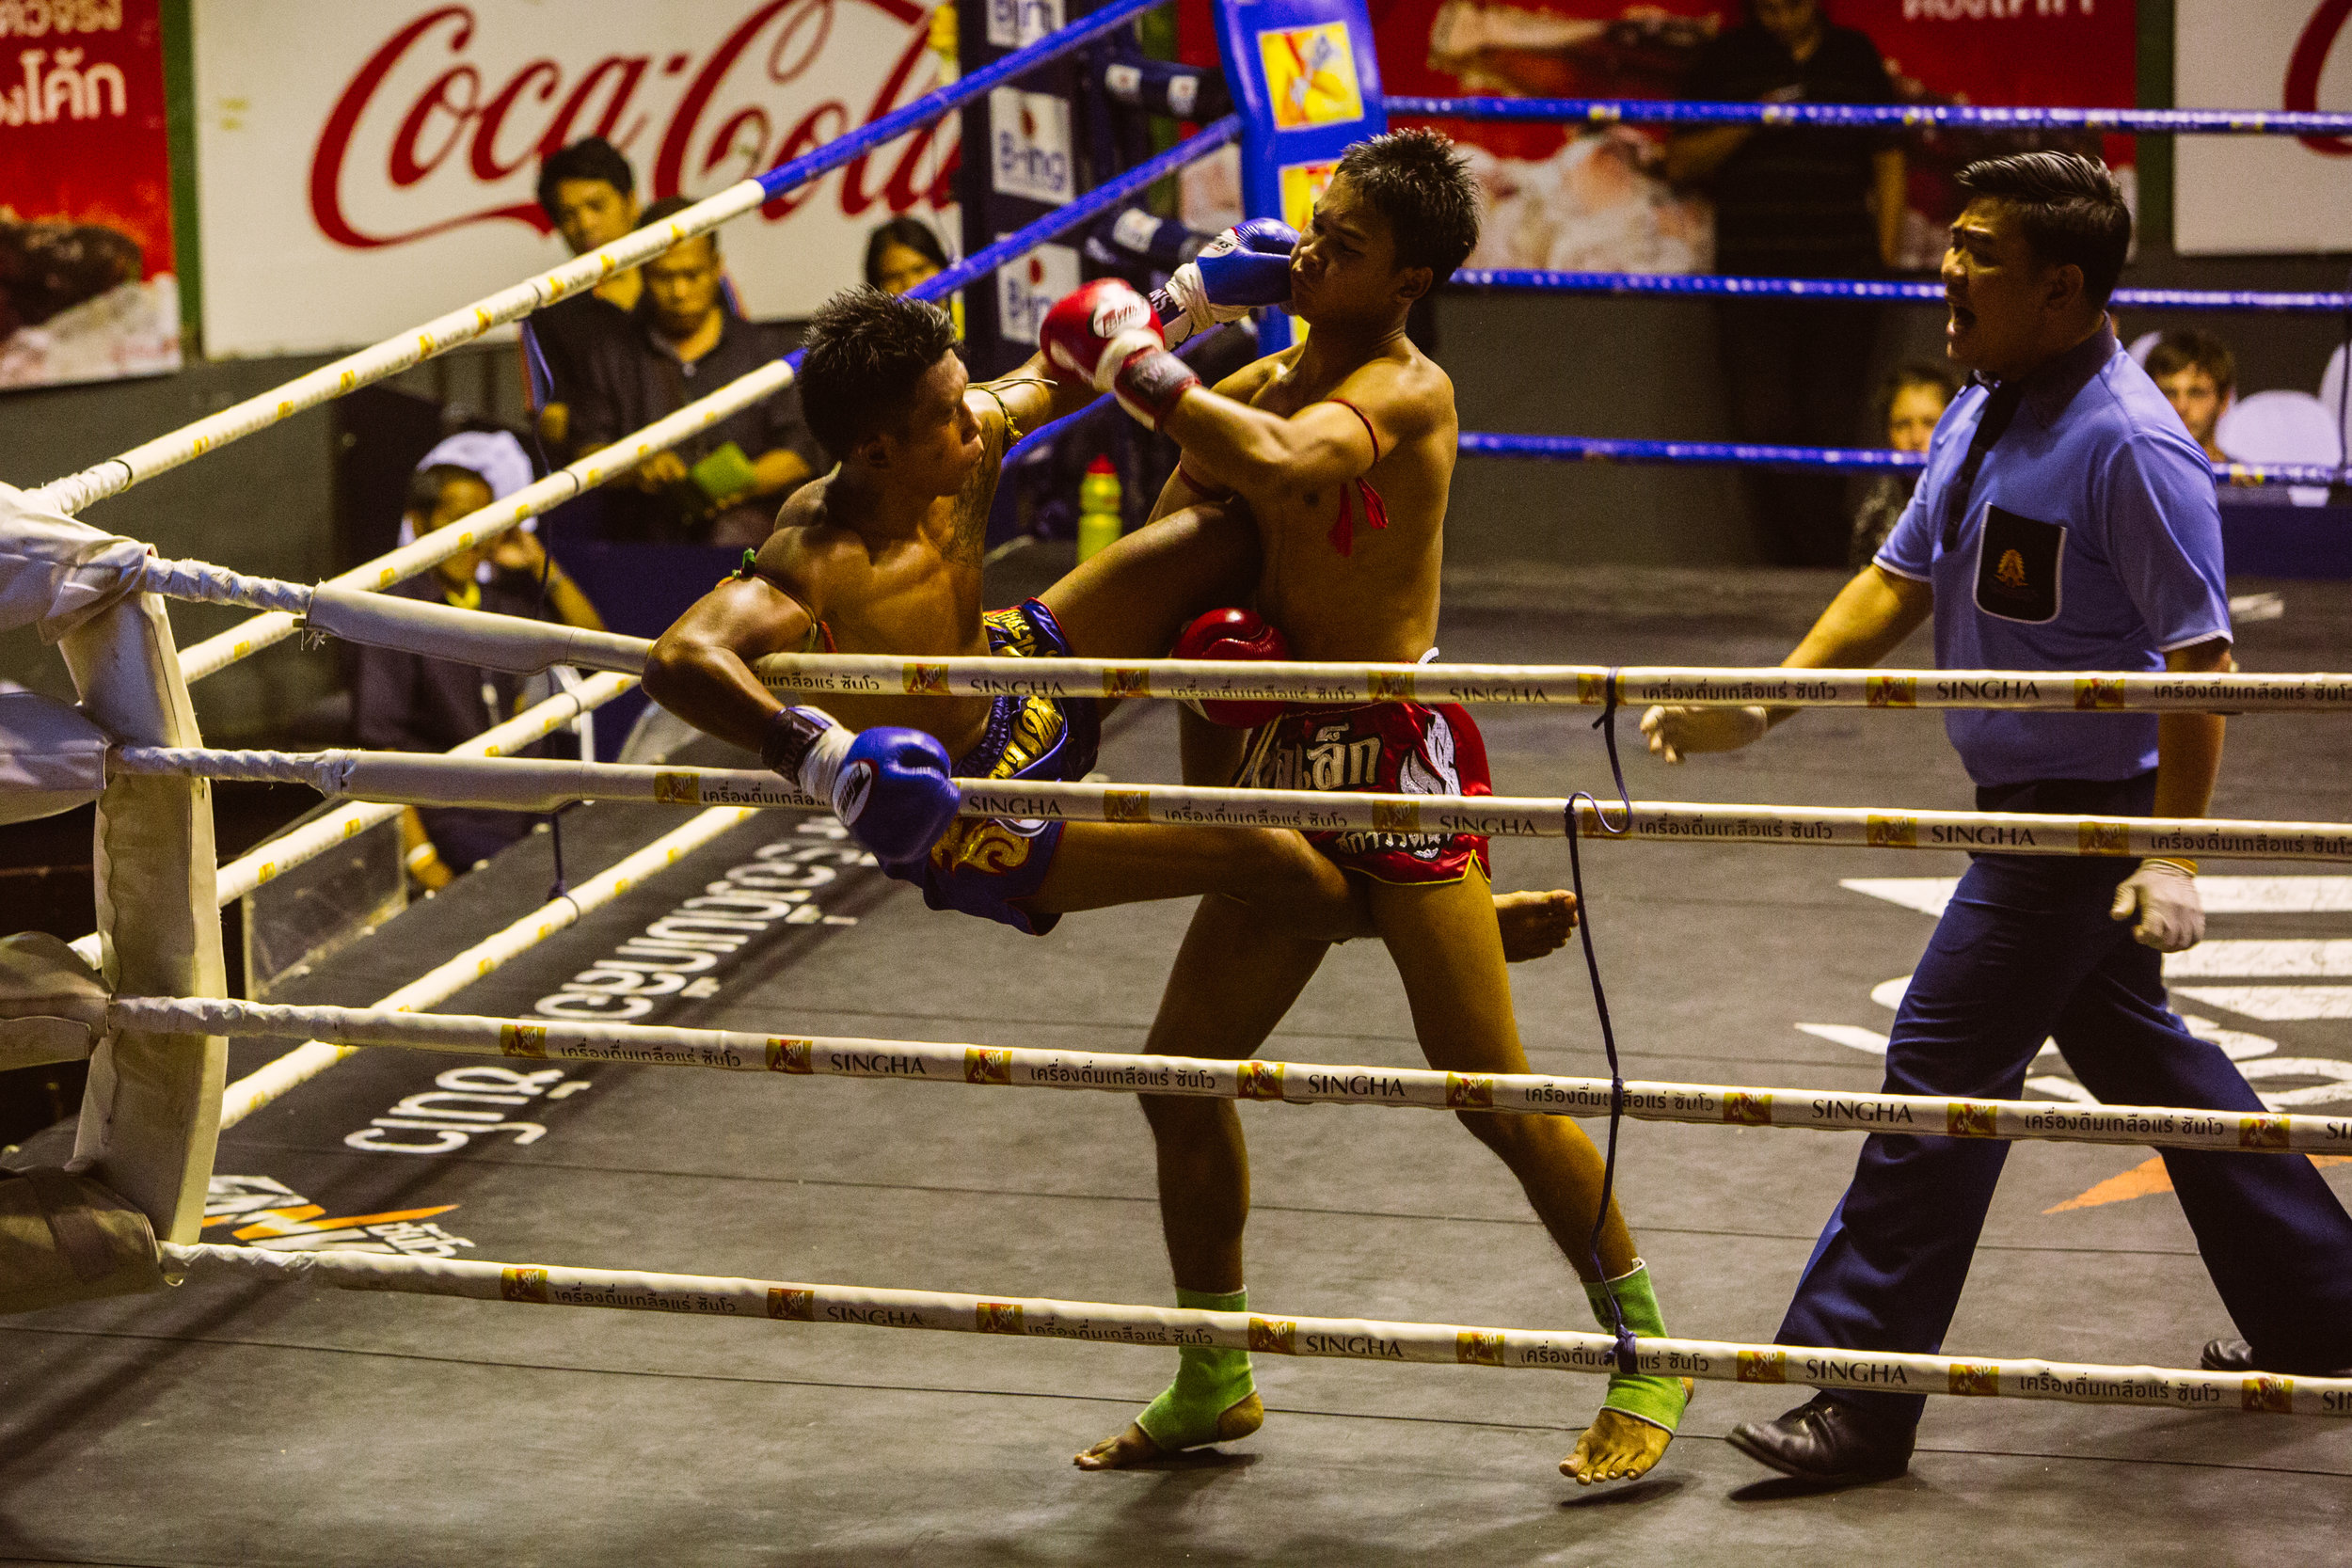 Muay Thai Fighting, Bangkok, Thailand